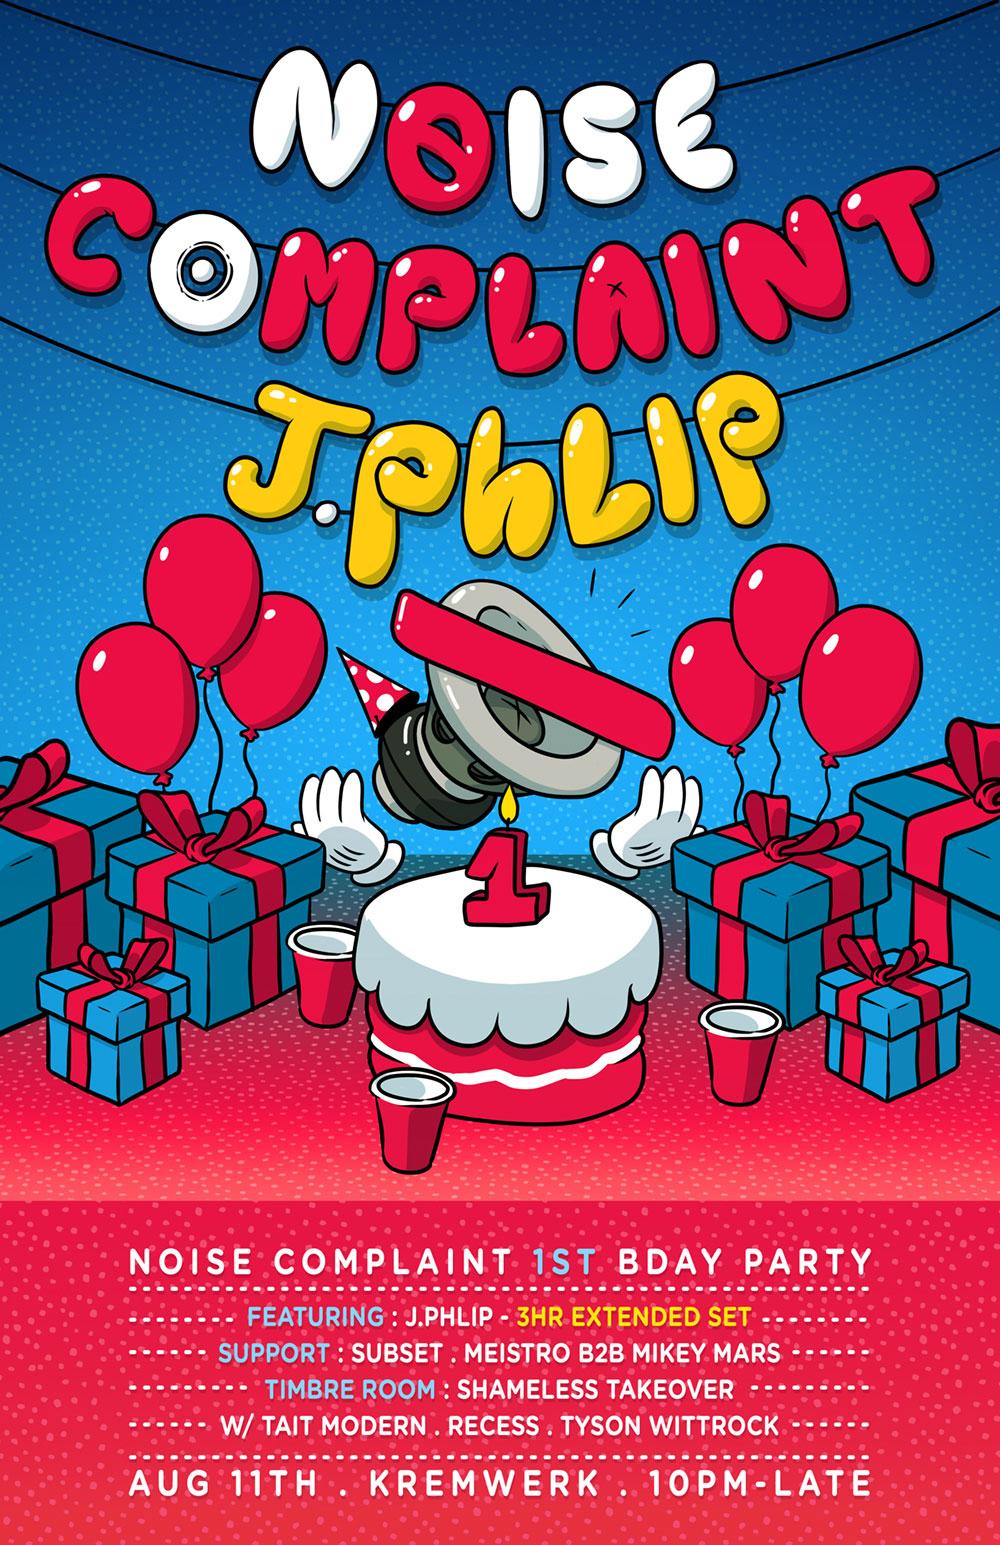 Noise Complaint Bday Flyer